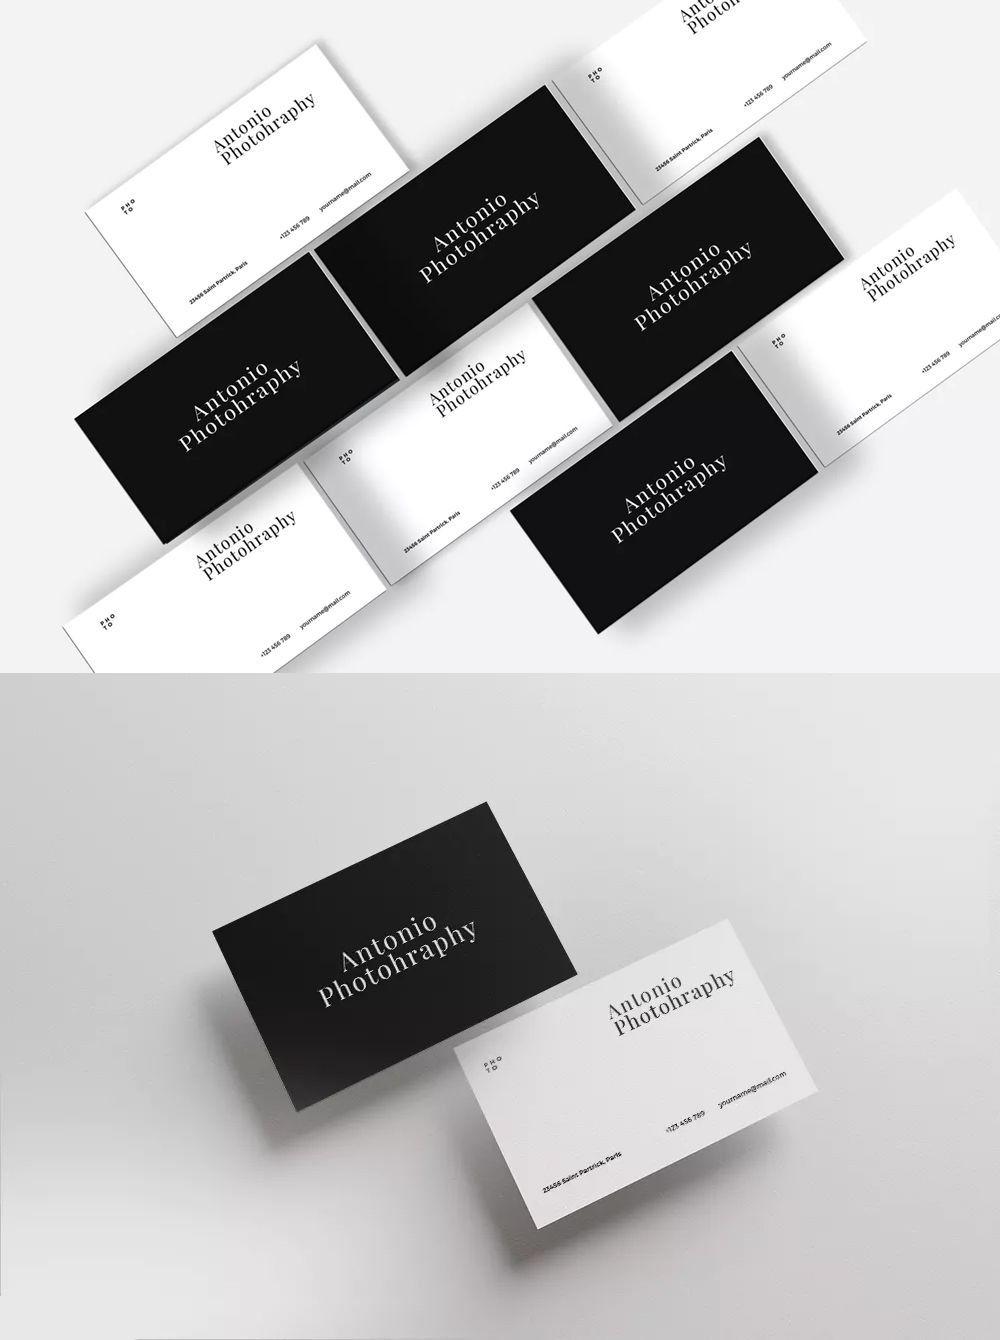 001 Striking Minimalist Busines Card Template Psd High Resolution Full